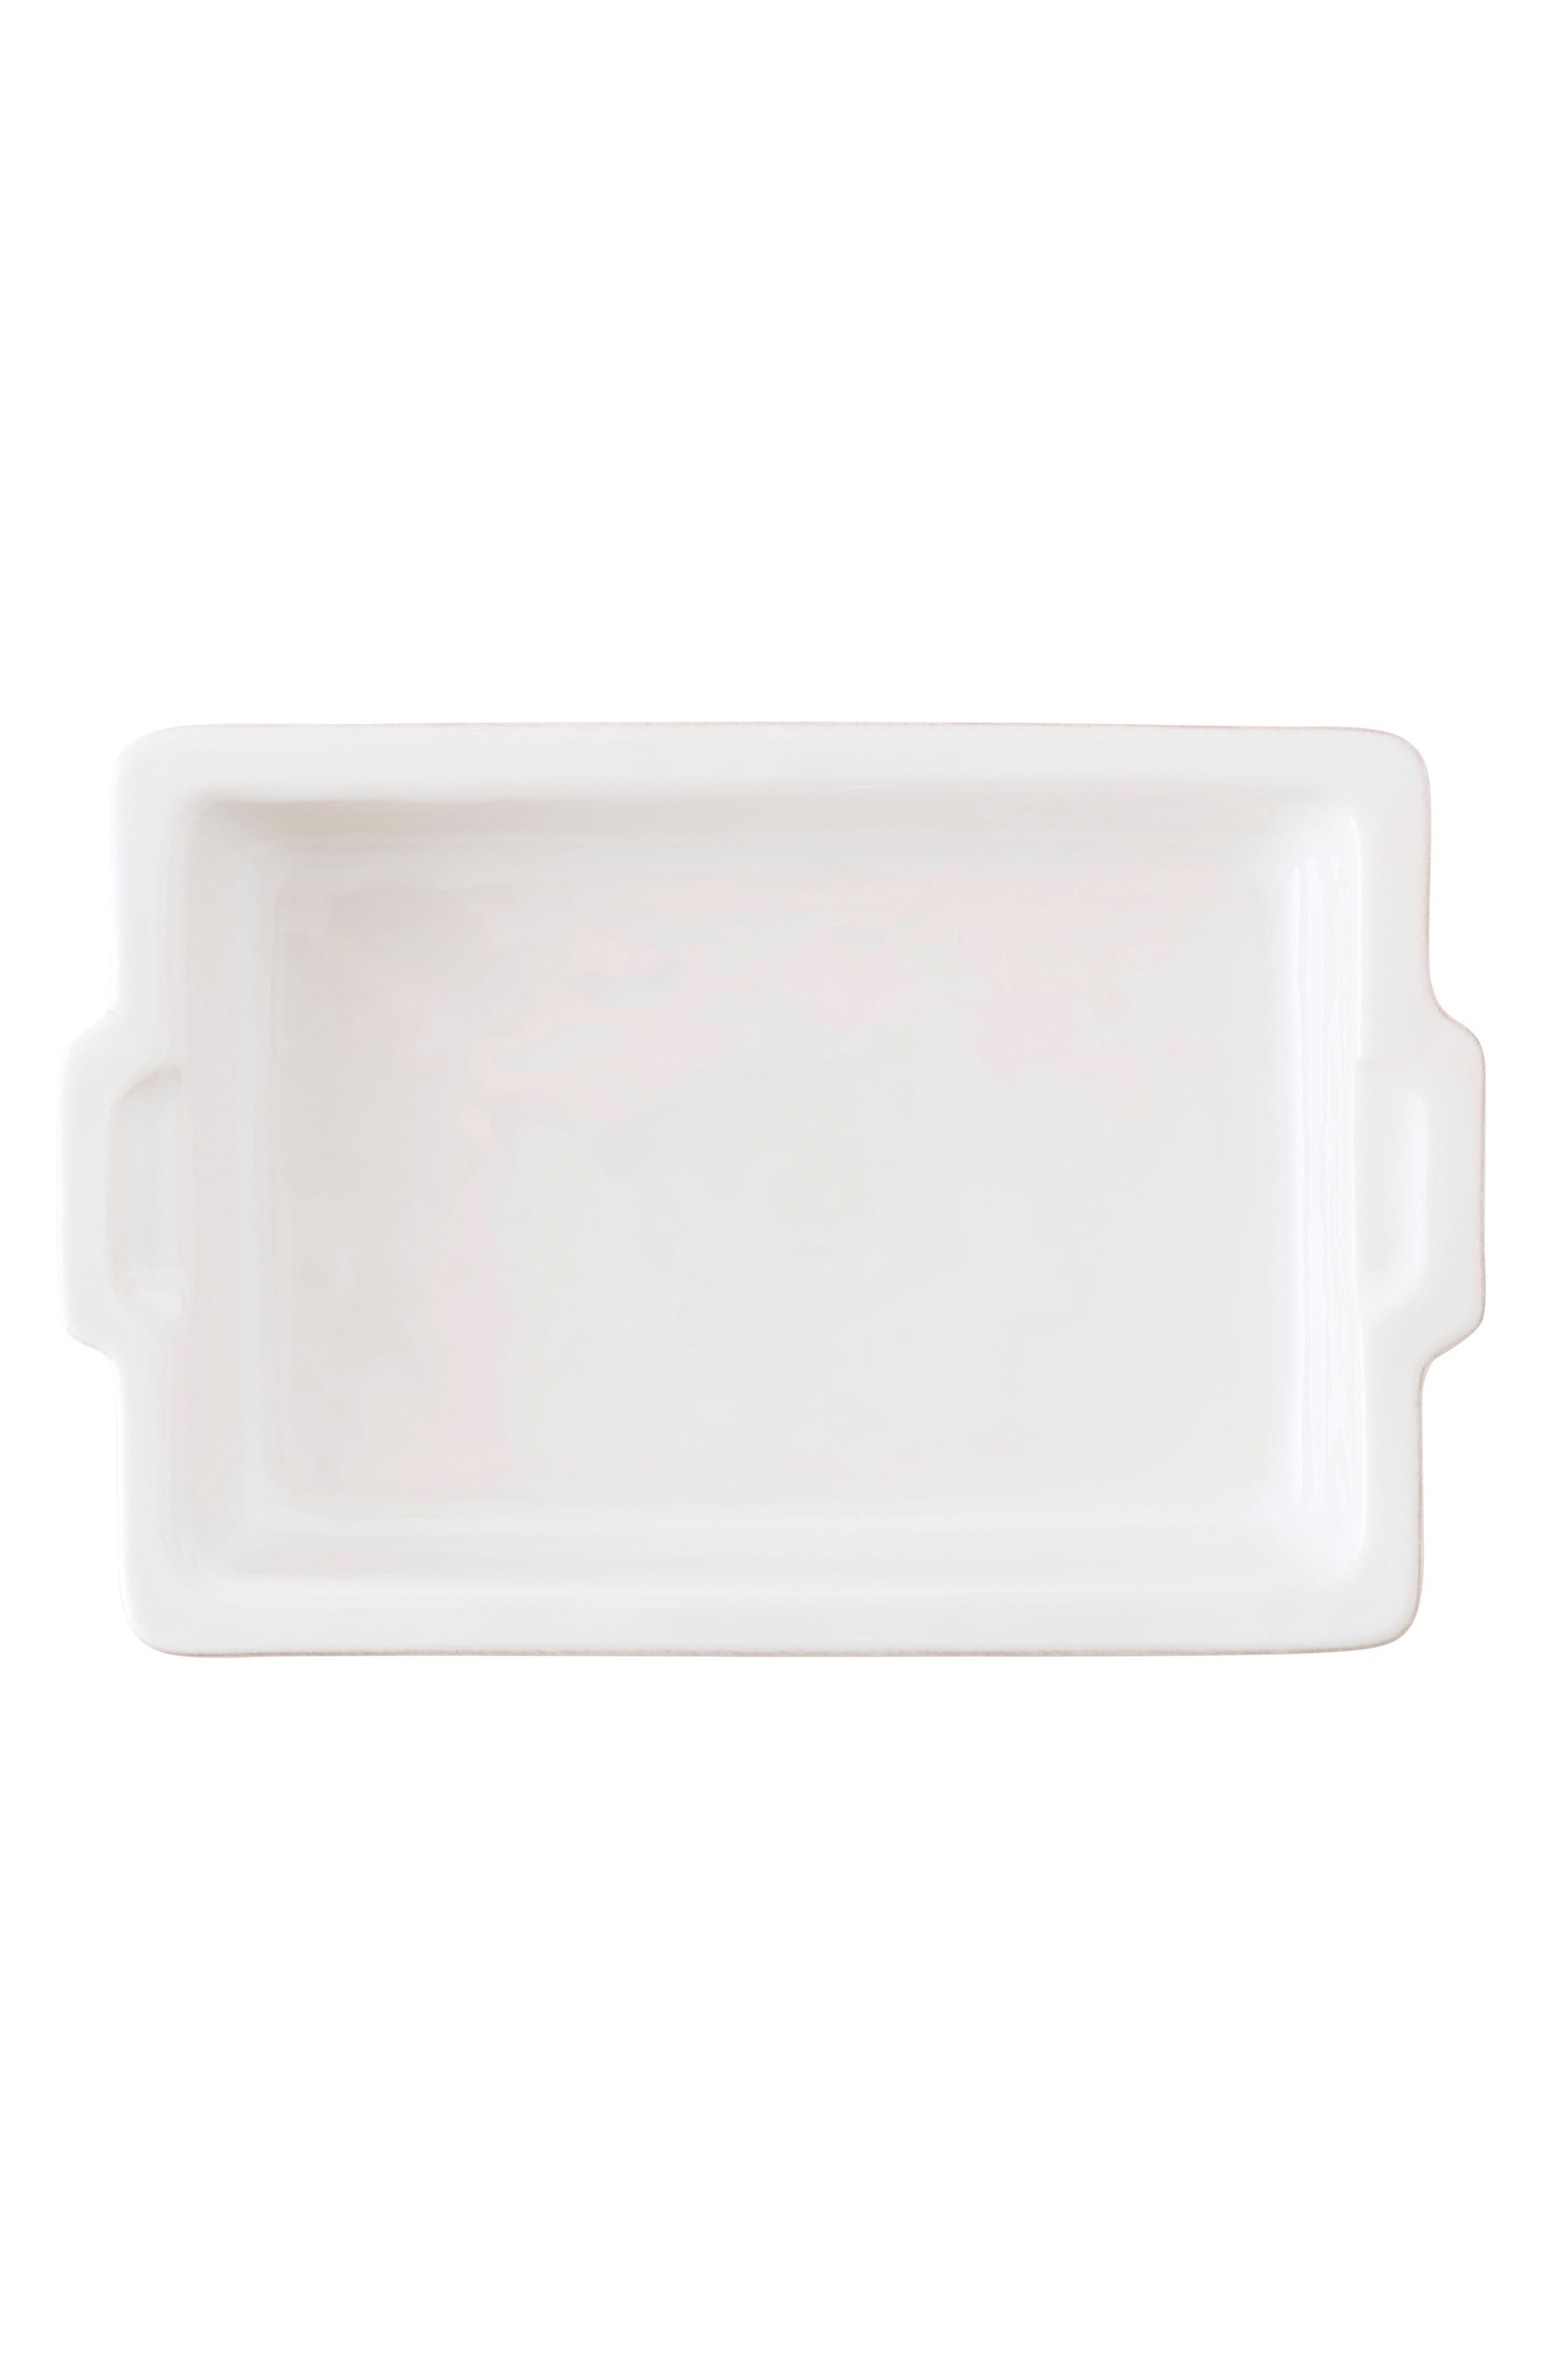 Puro Large Ceramic Baking Dish,                             Alternate thumbnail 2, color,                             WHITEWASH